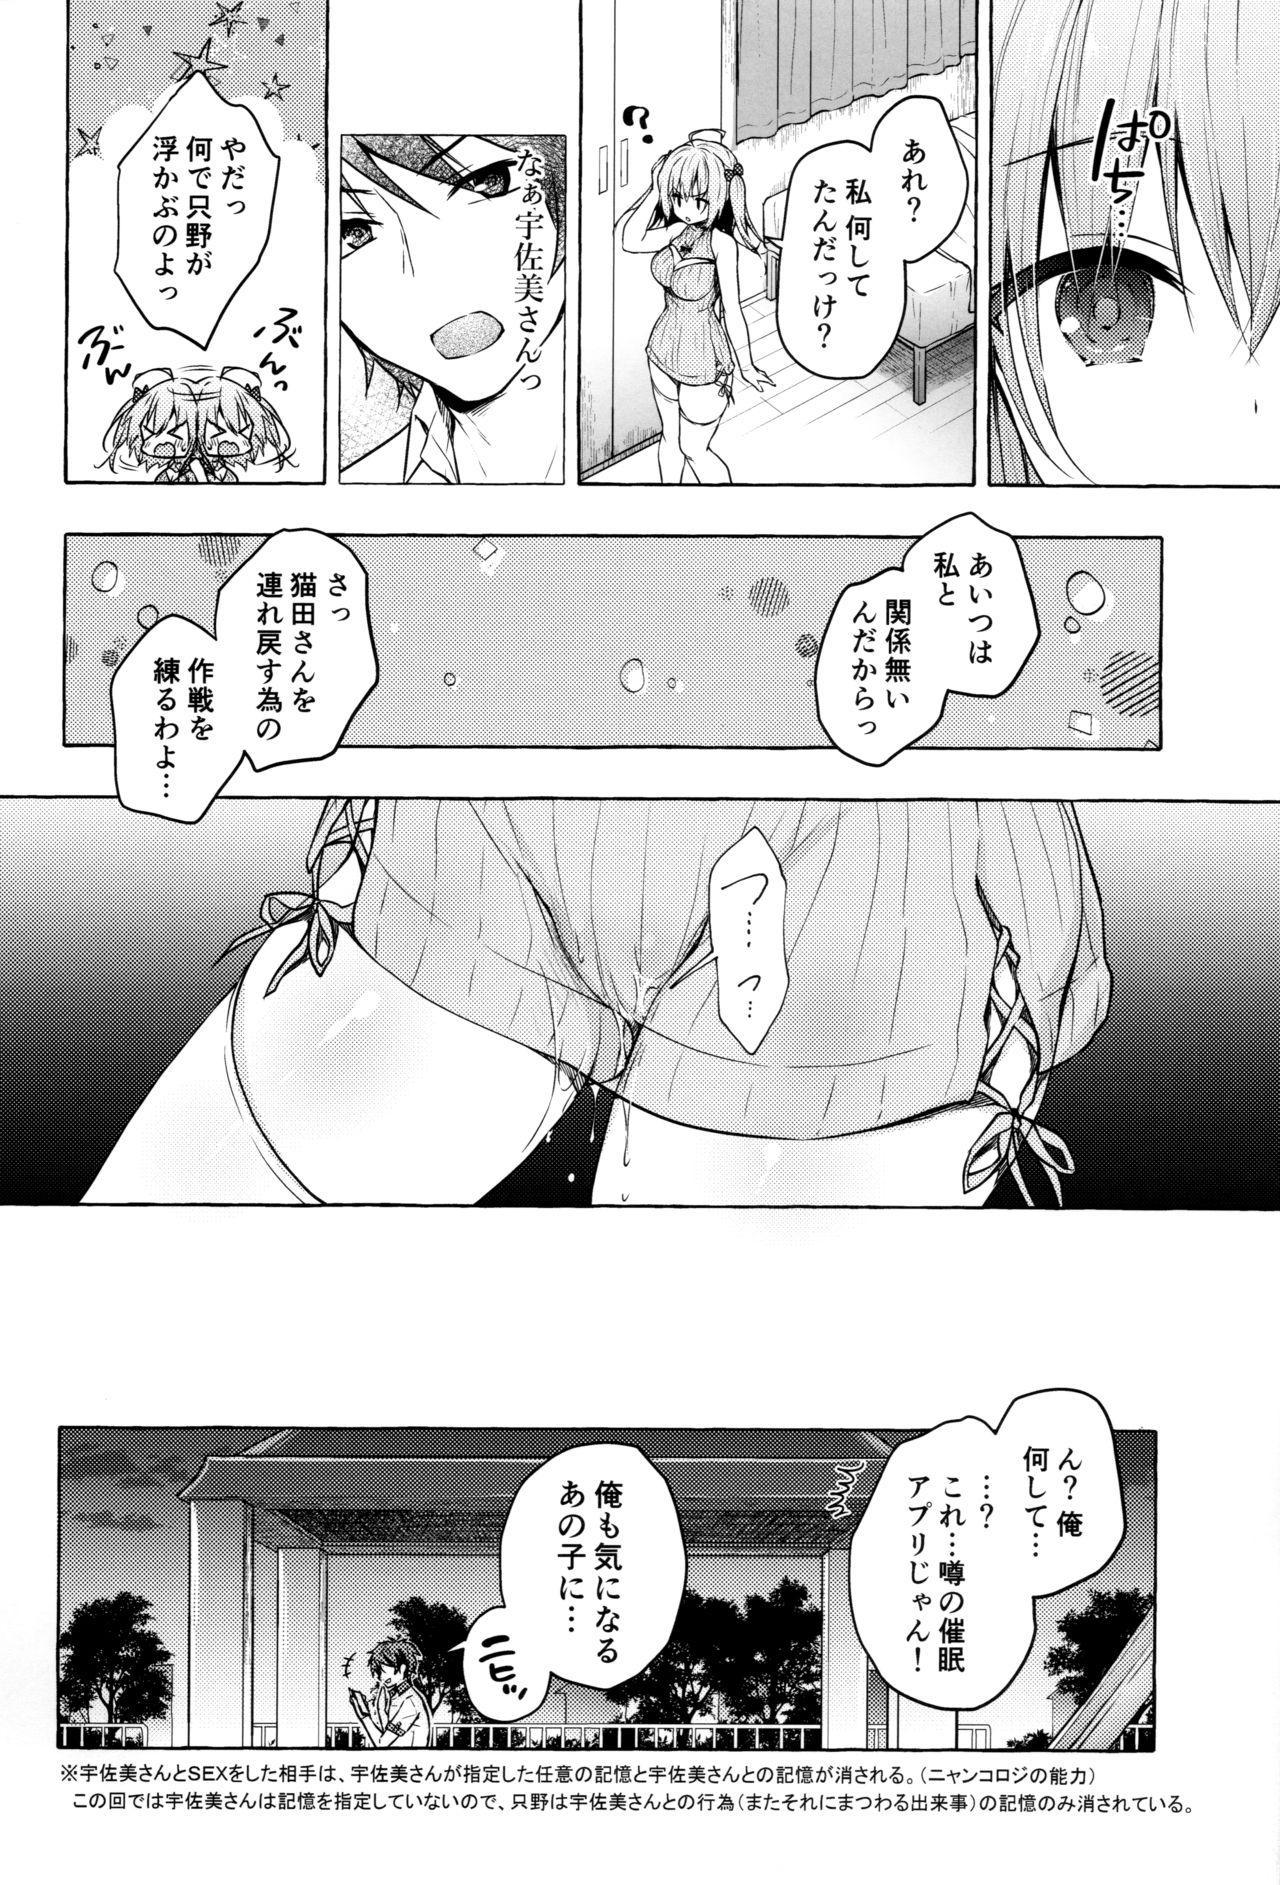 (C96) [Kinokonomi (konomi)] Saimin Usami-san -Nyancologism 2- 18